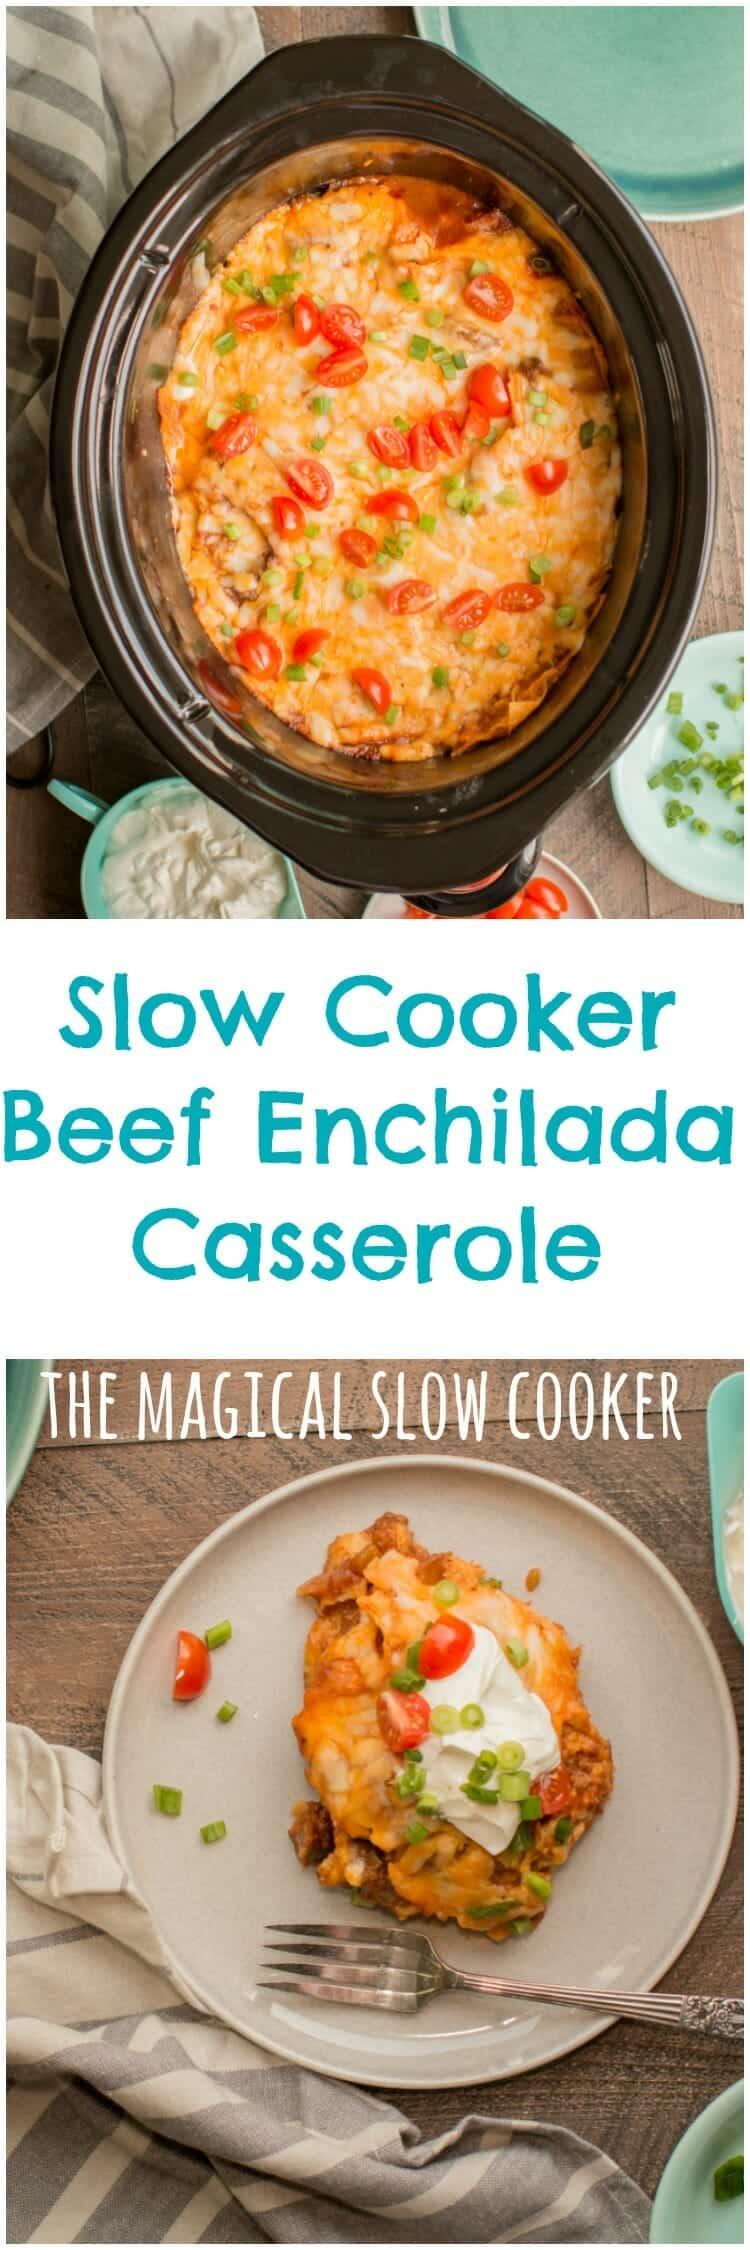 Slow Cooker Beef Enchilada Casserole